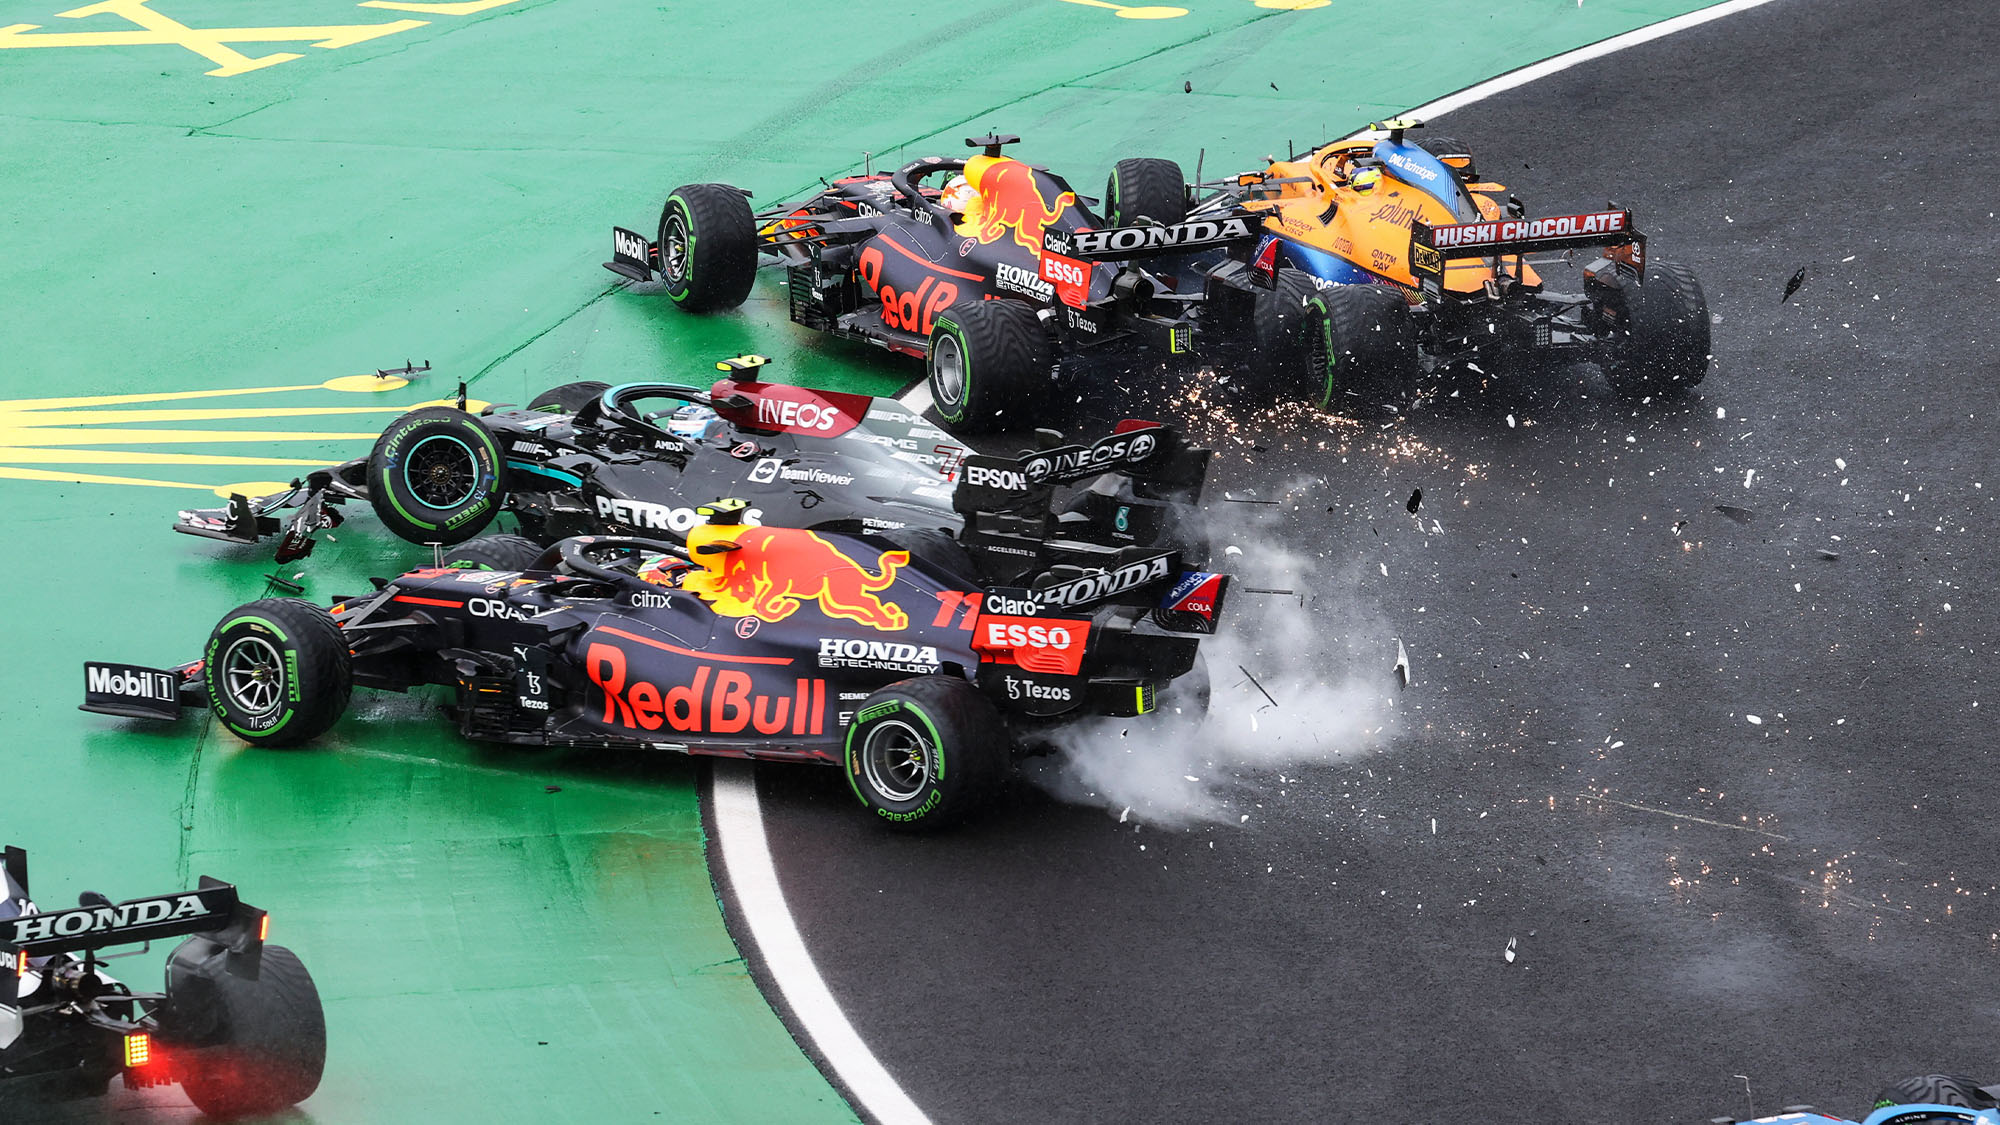 Turn one crash at the 2021 Hungarian Grand Prix